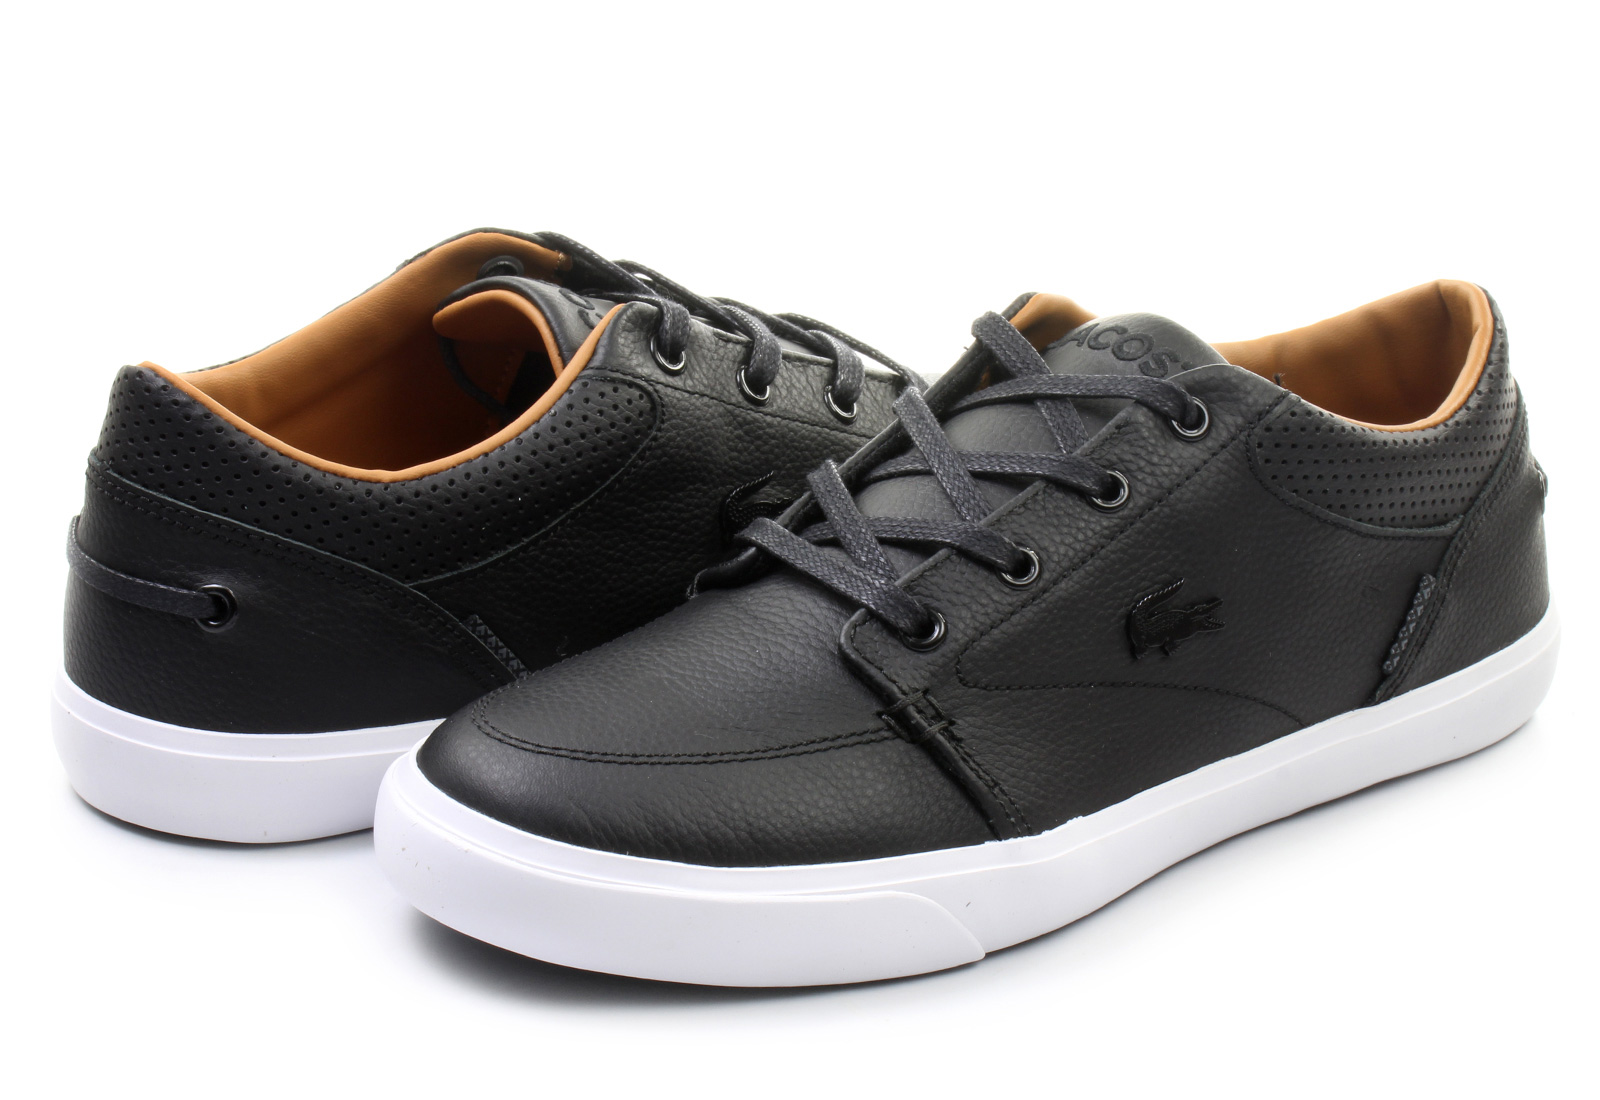 Lacoste sneakers women price